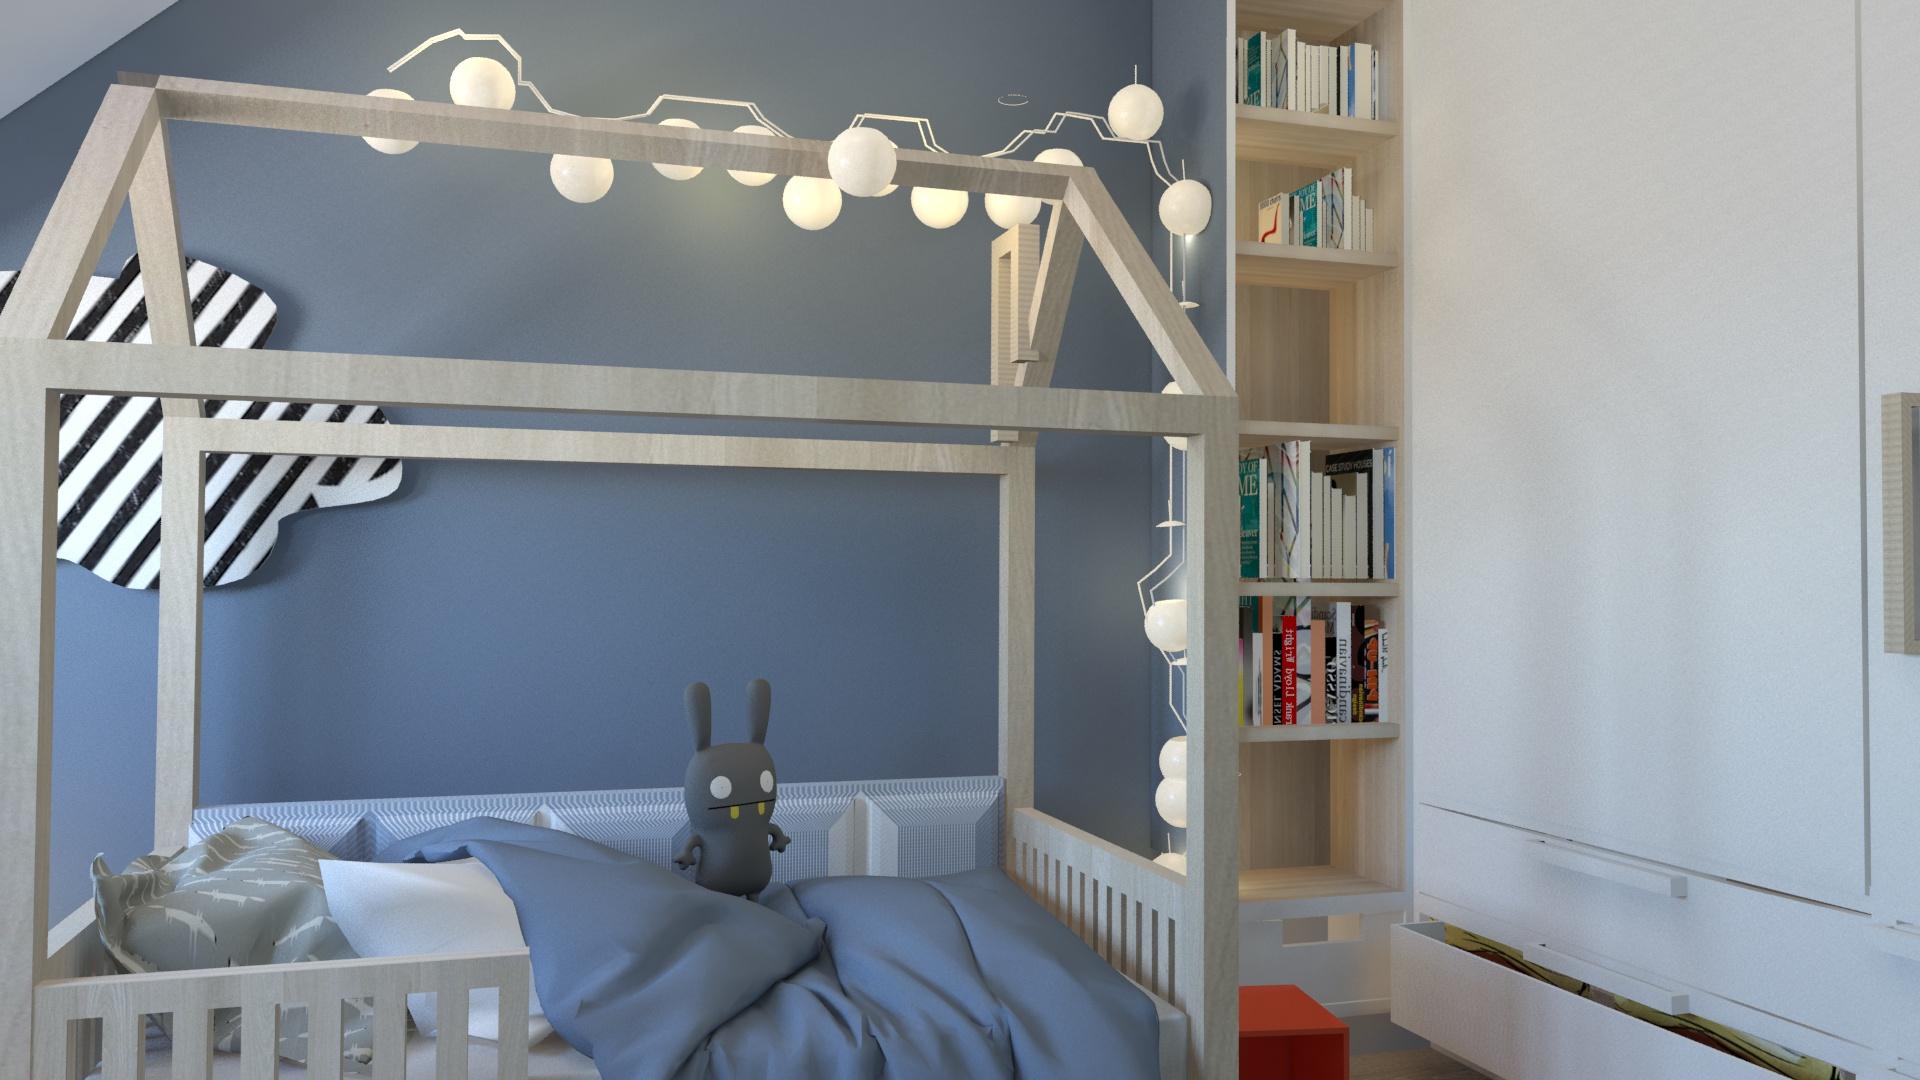 projekt pokoju dla trzyletniego ch opca aleksandra jankowska. Black Bedroom Furniture Sets. Home Design Ideas